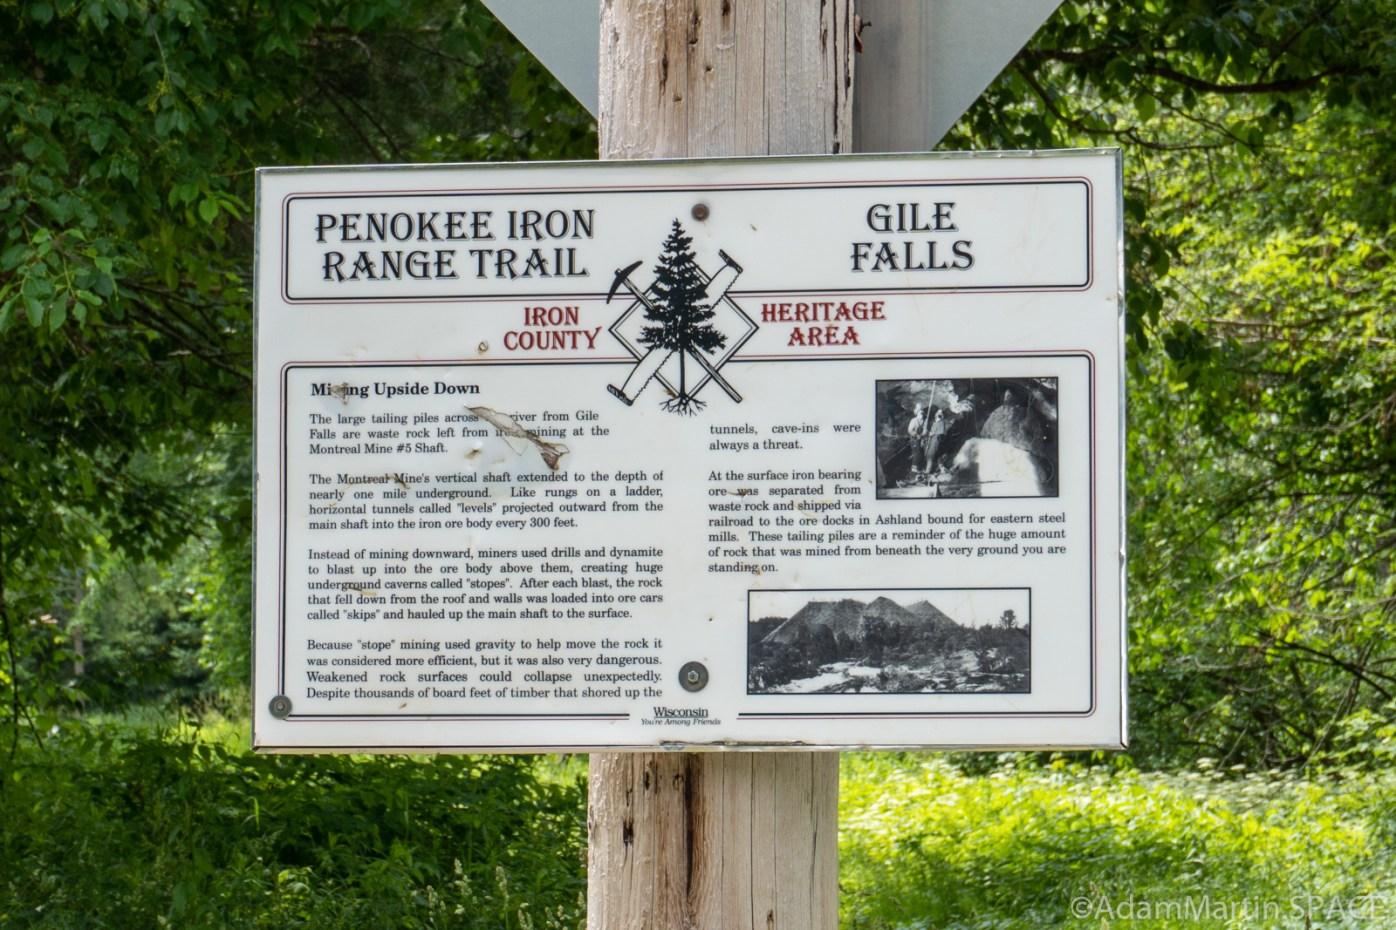 Gile Falls - Penokee Iron Range Trail sign